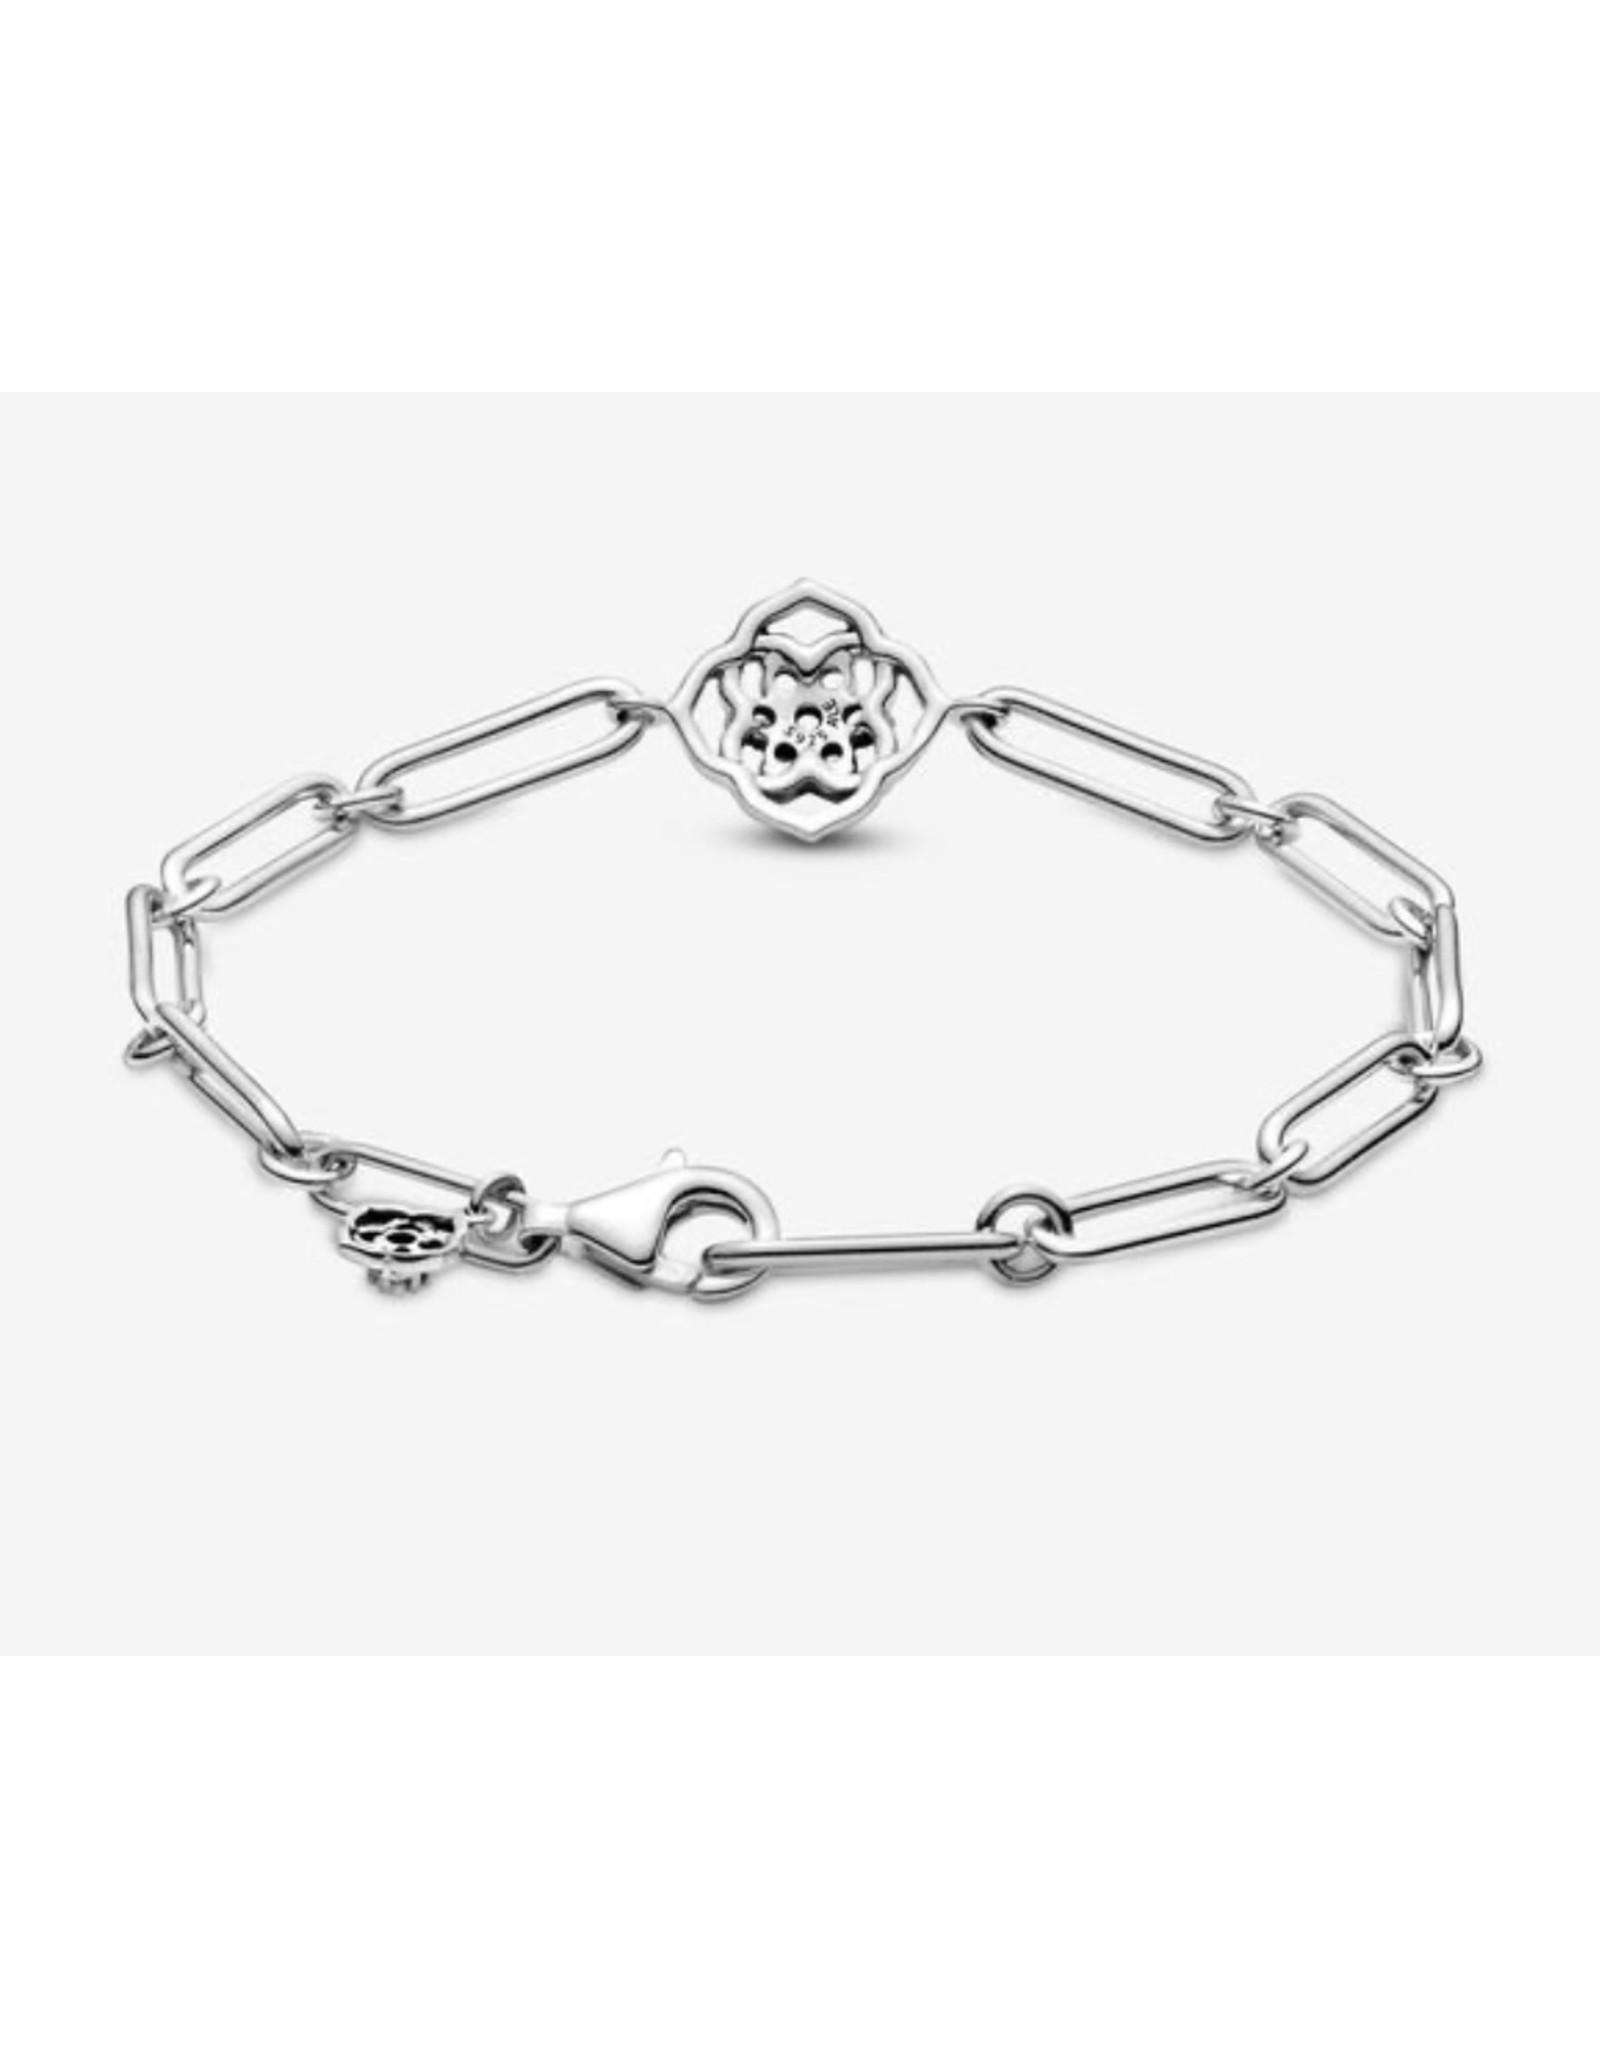 Pandora Pandora Bracelet, 599409C01, Rose Petals Link Bracelet, Clear CZ